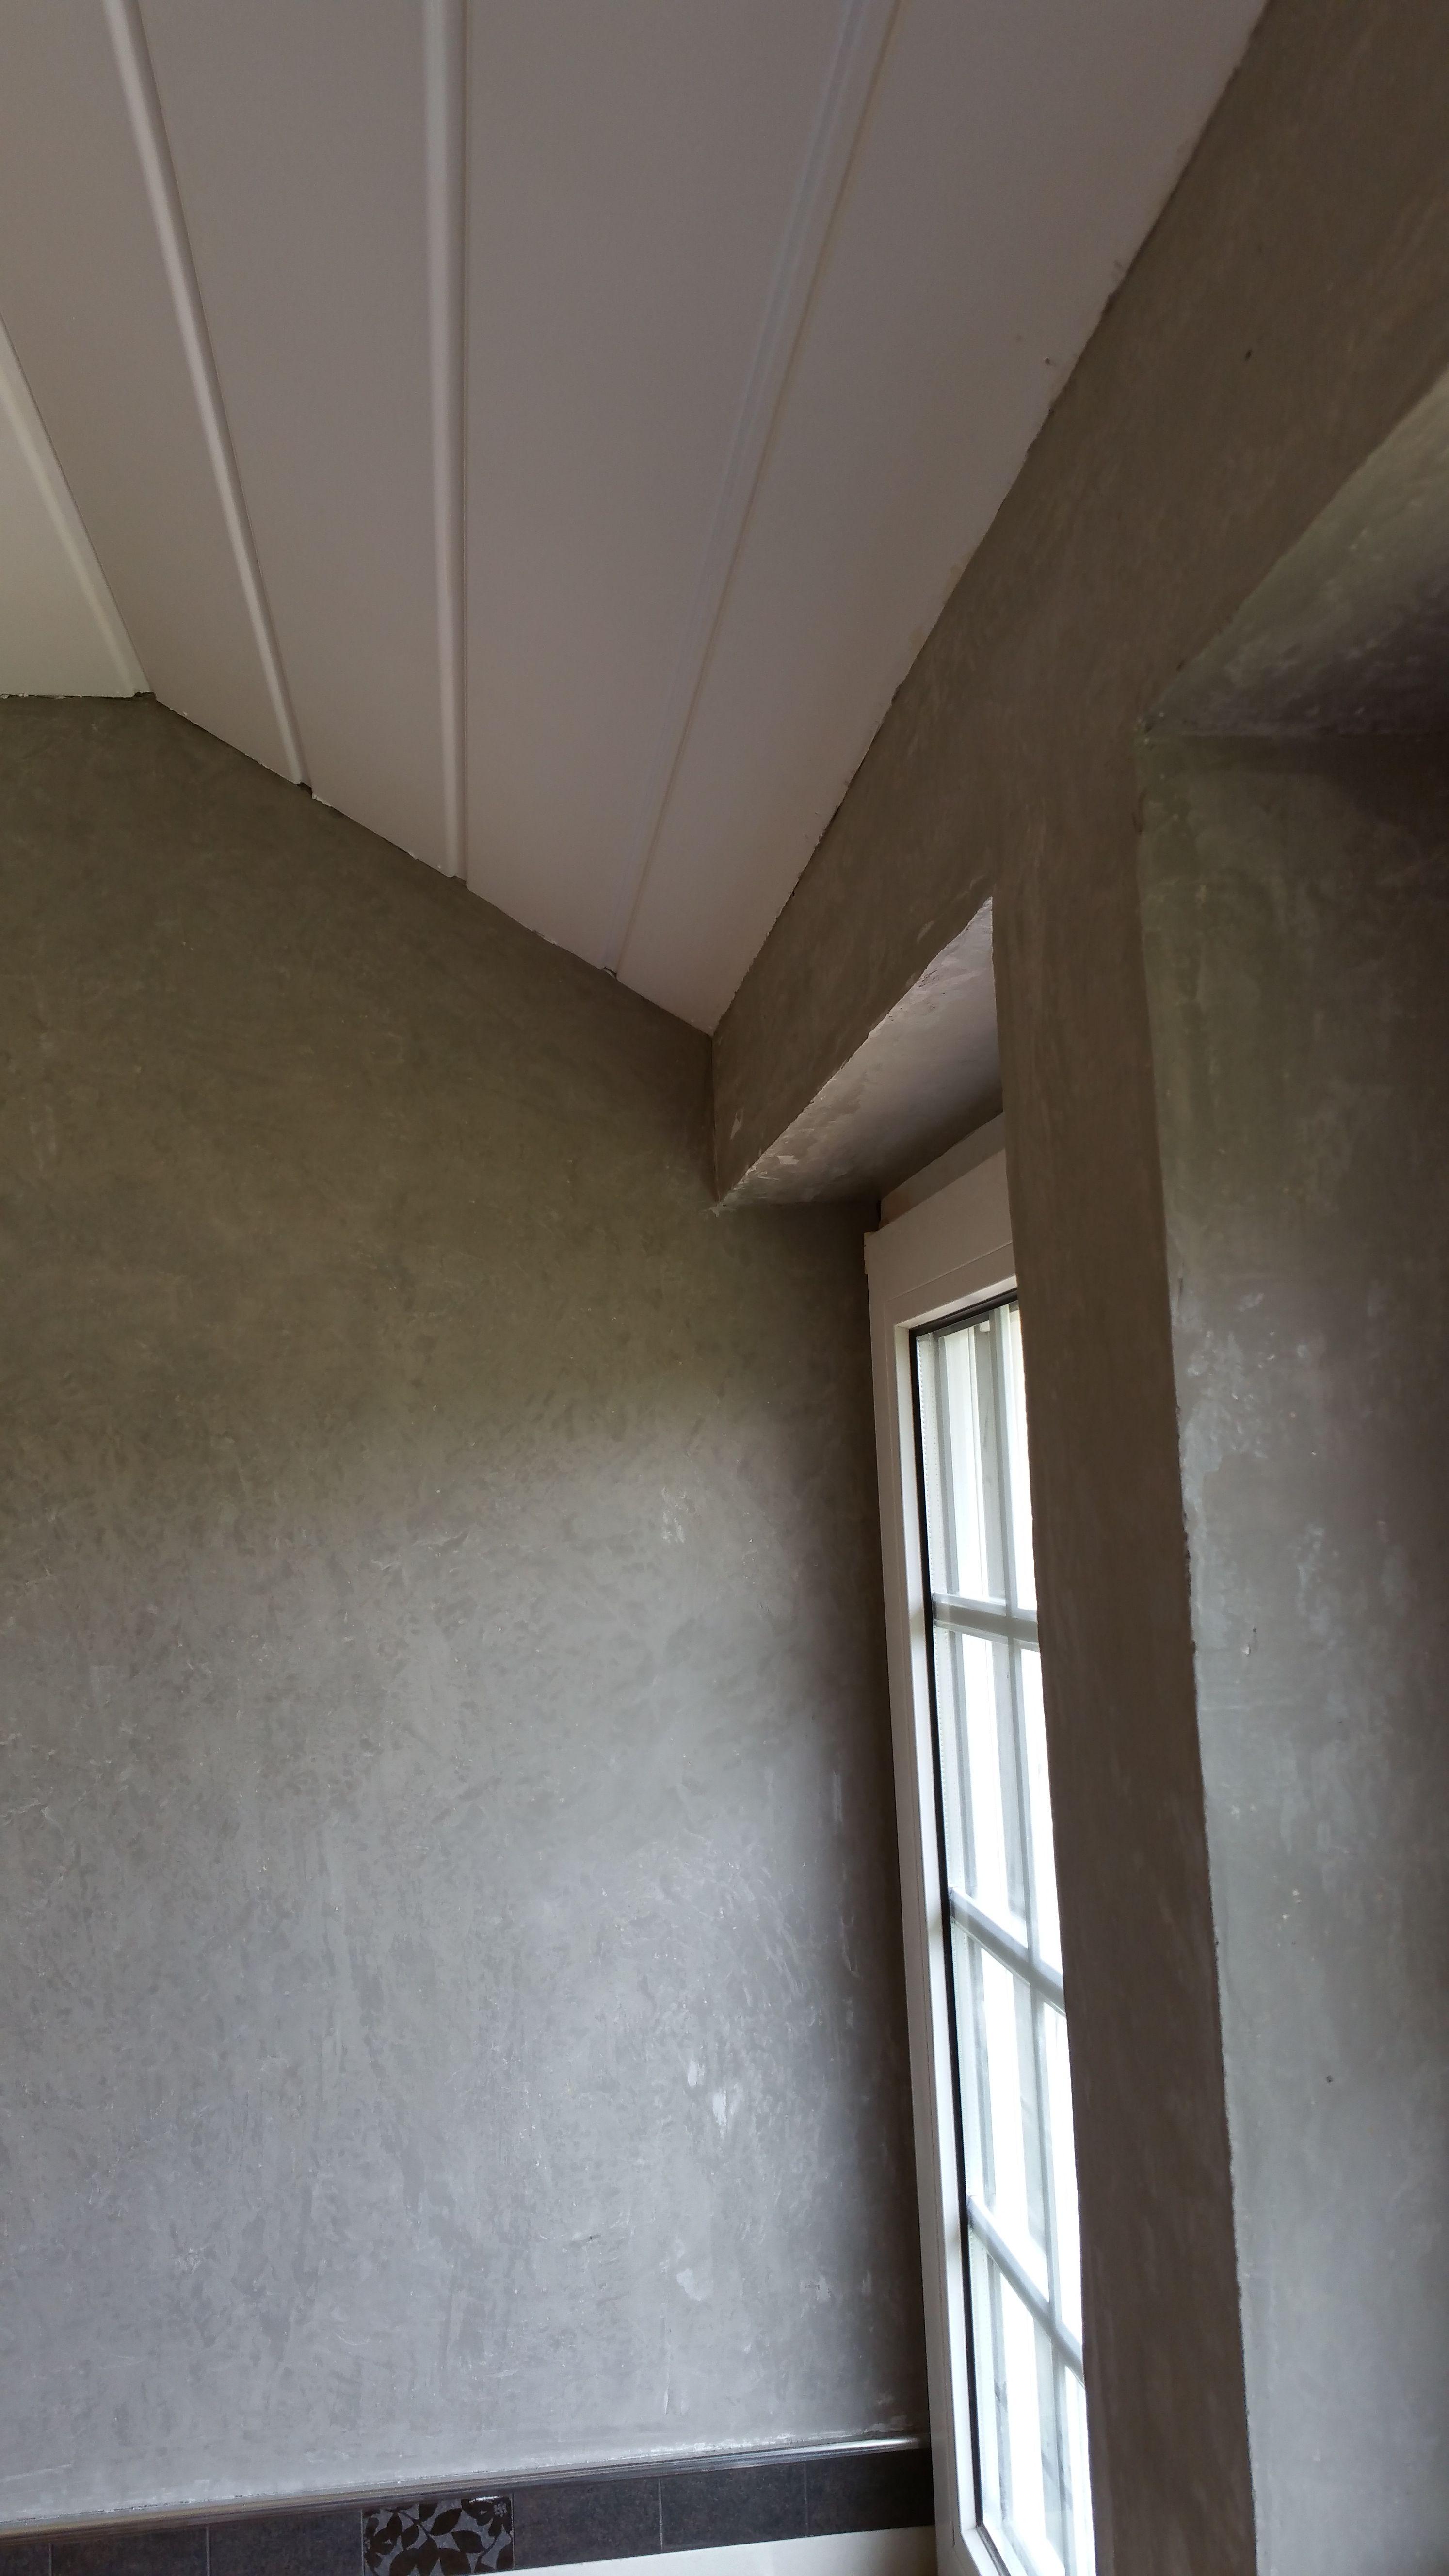 putz wand wand in betonoptik tapete fliesen oder putz with putz wand awesome weien putz wand. Black Bedroom Furniture Sets. Home Design Ideas